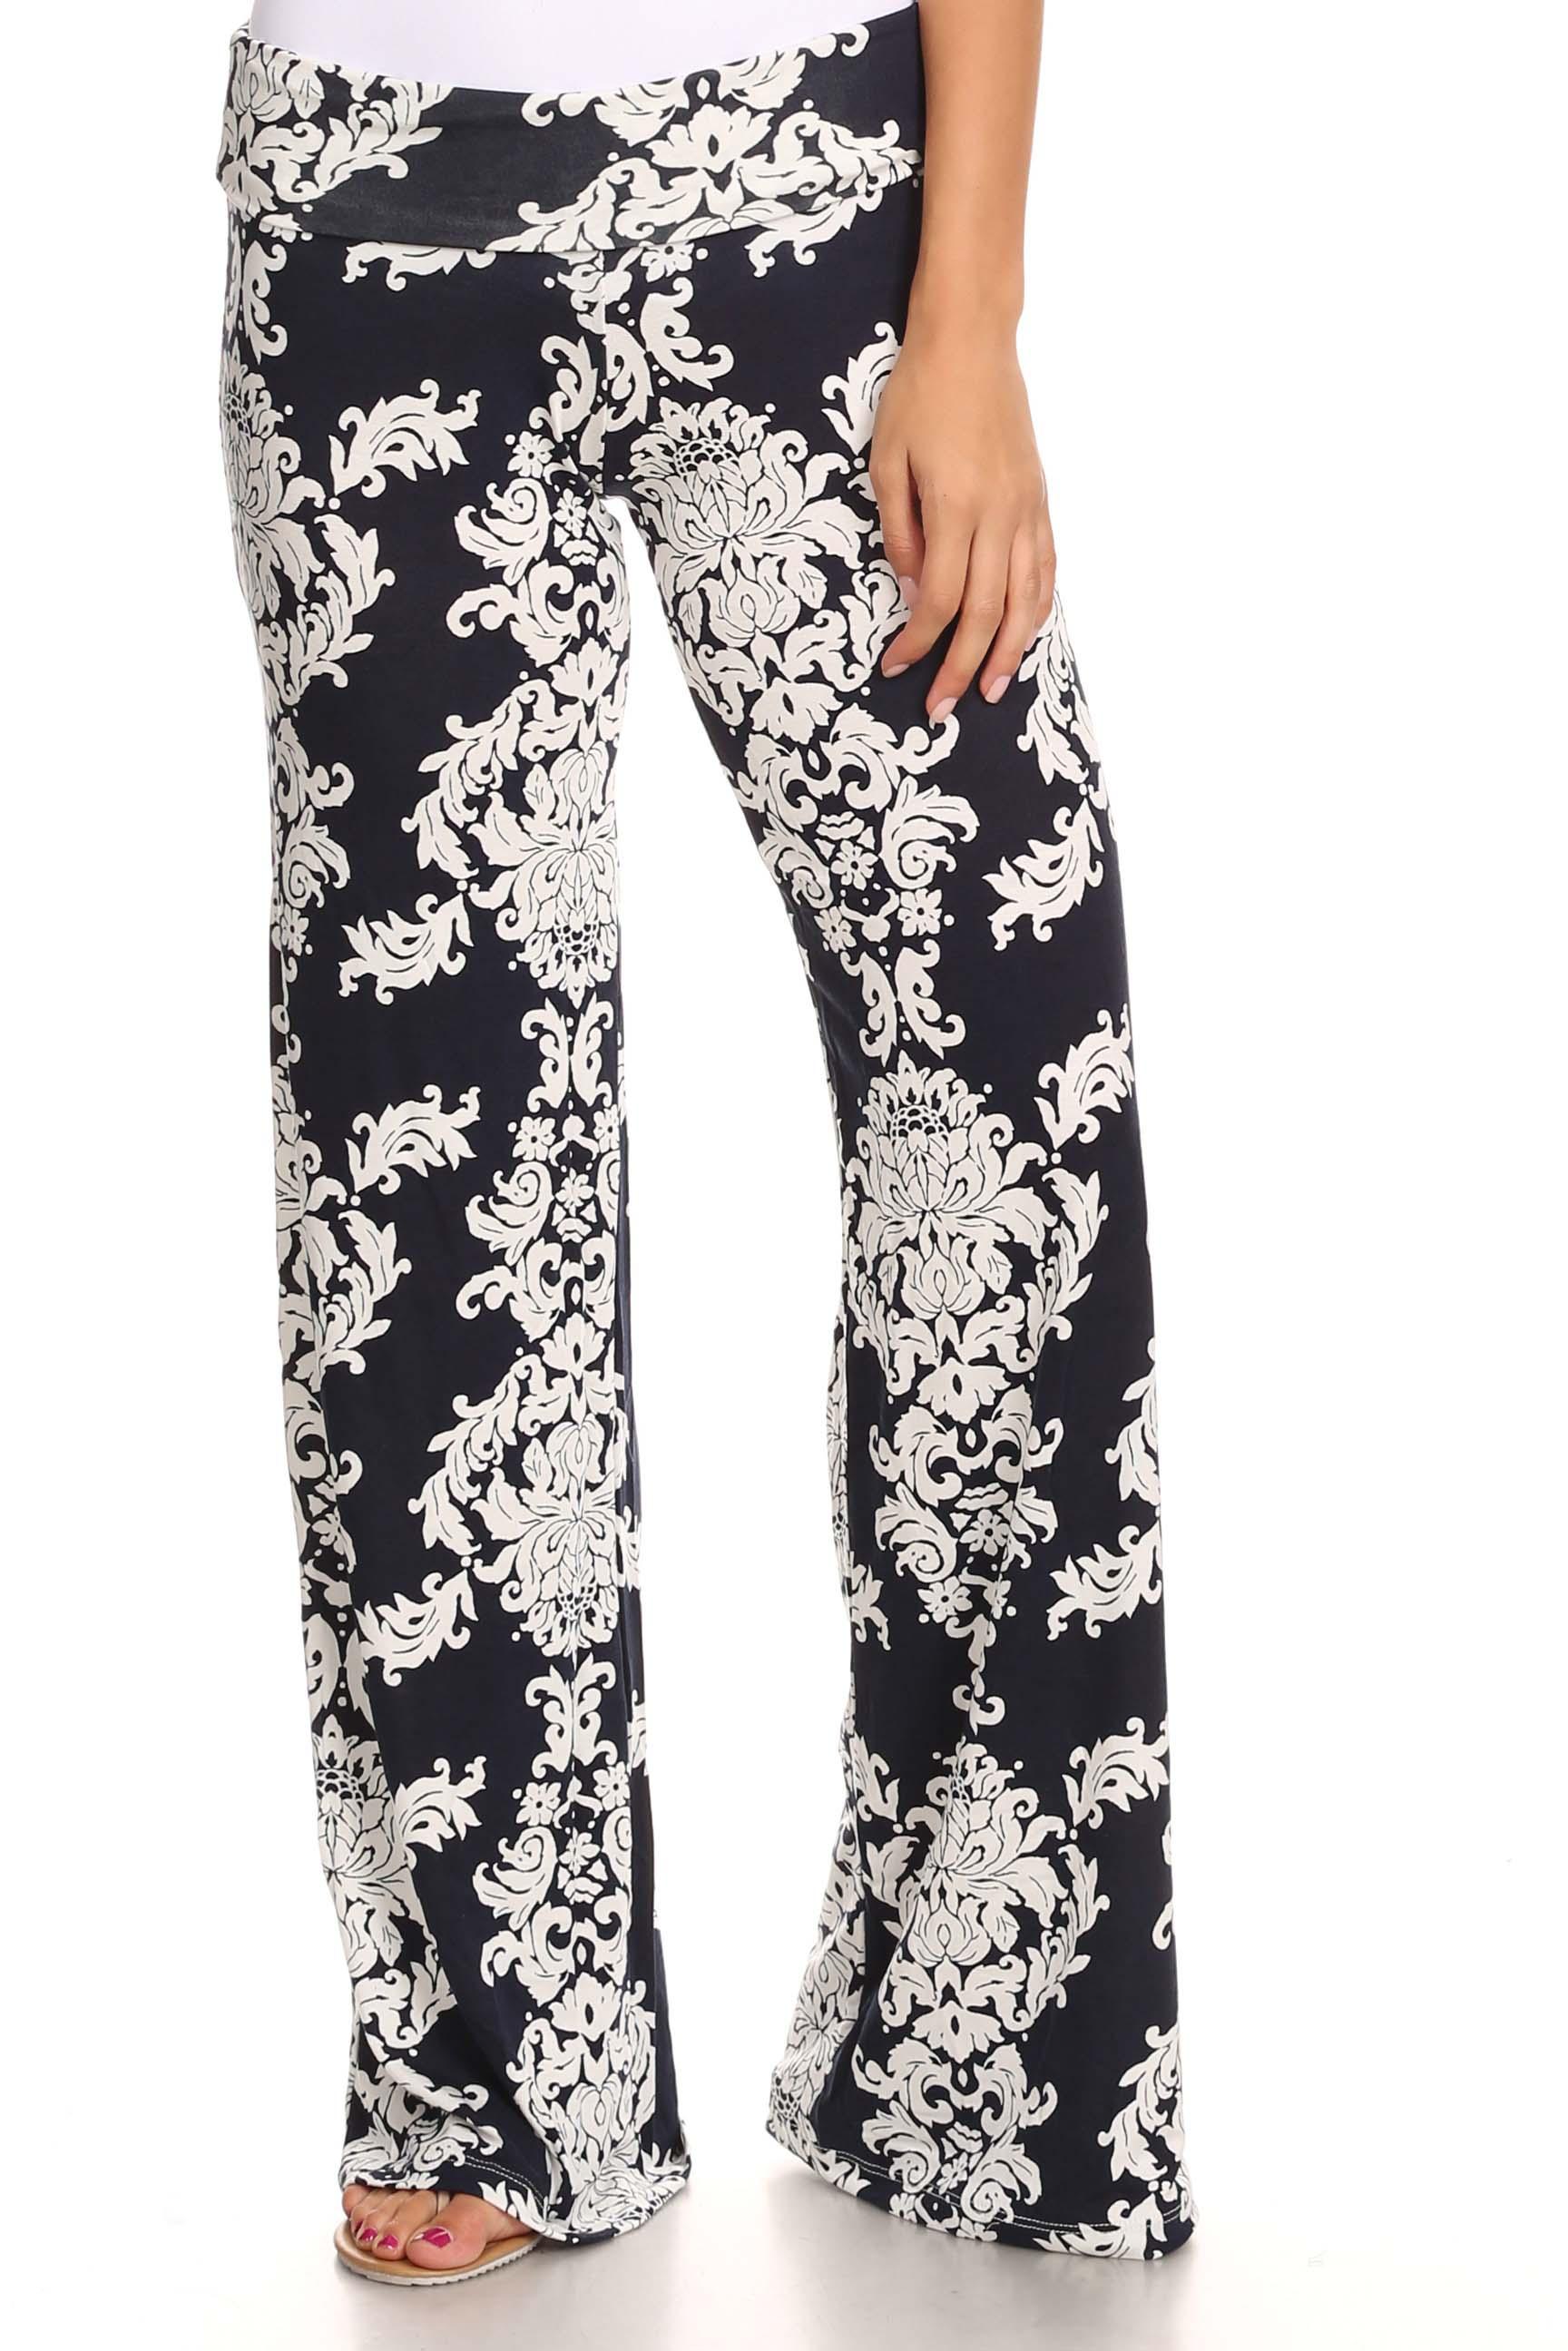 Creative Lofbaz Womenu0026#39;s Pattern Printed Wide Leg Harem Palazzo Pants Trousers | EBay